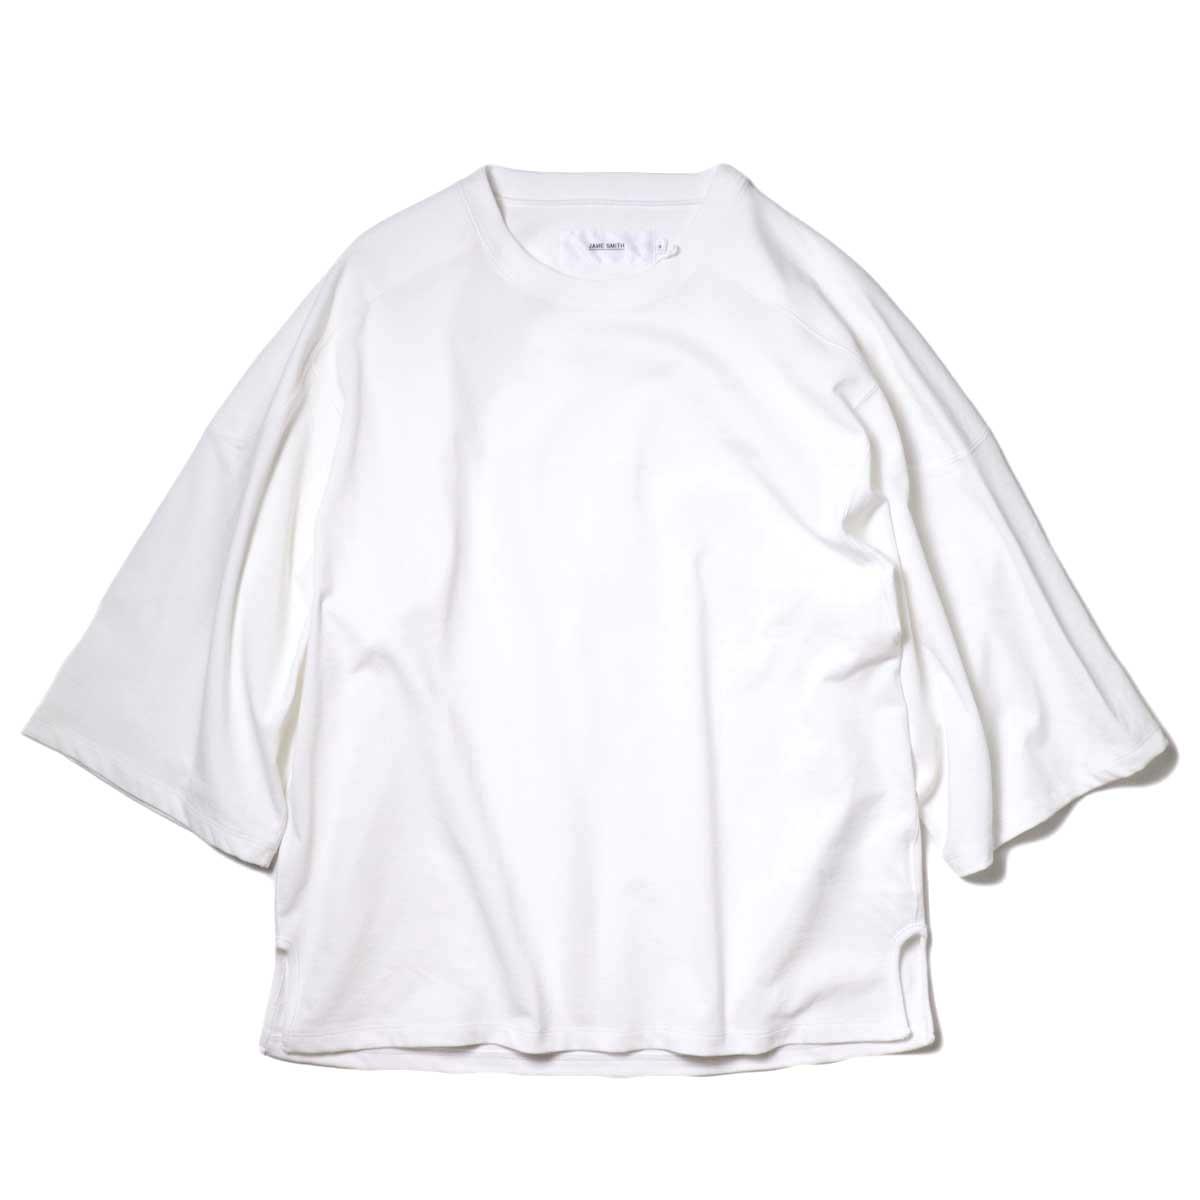 JANE SMITH / CLASSIC FOOTBALL T-SHIRT (White)